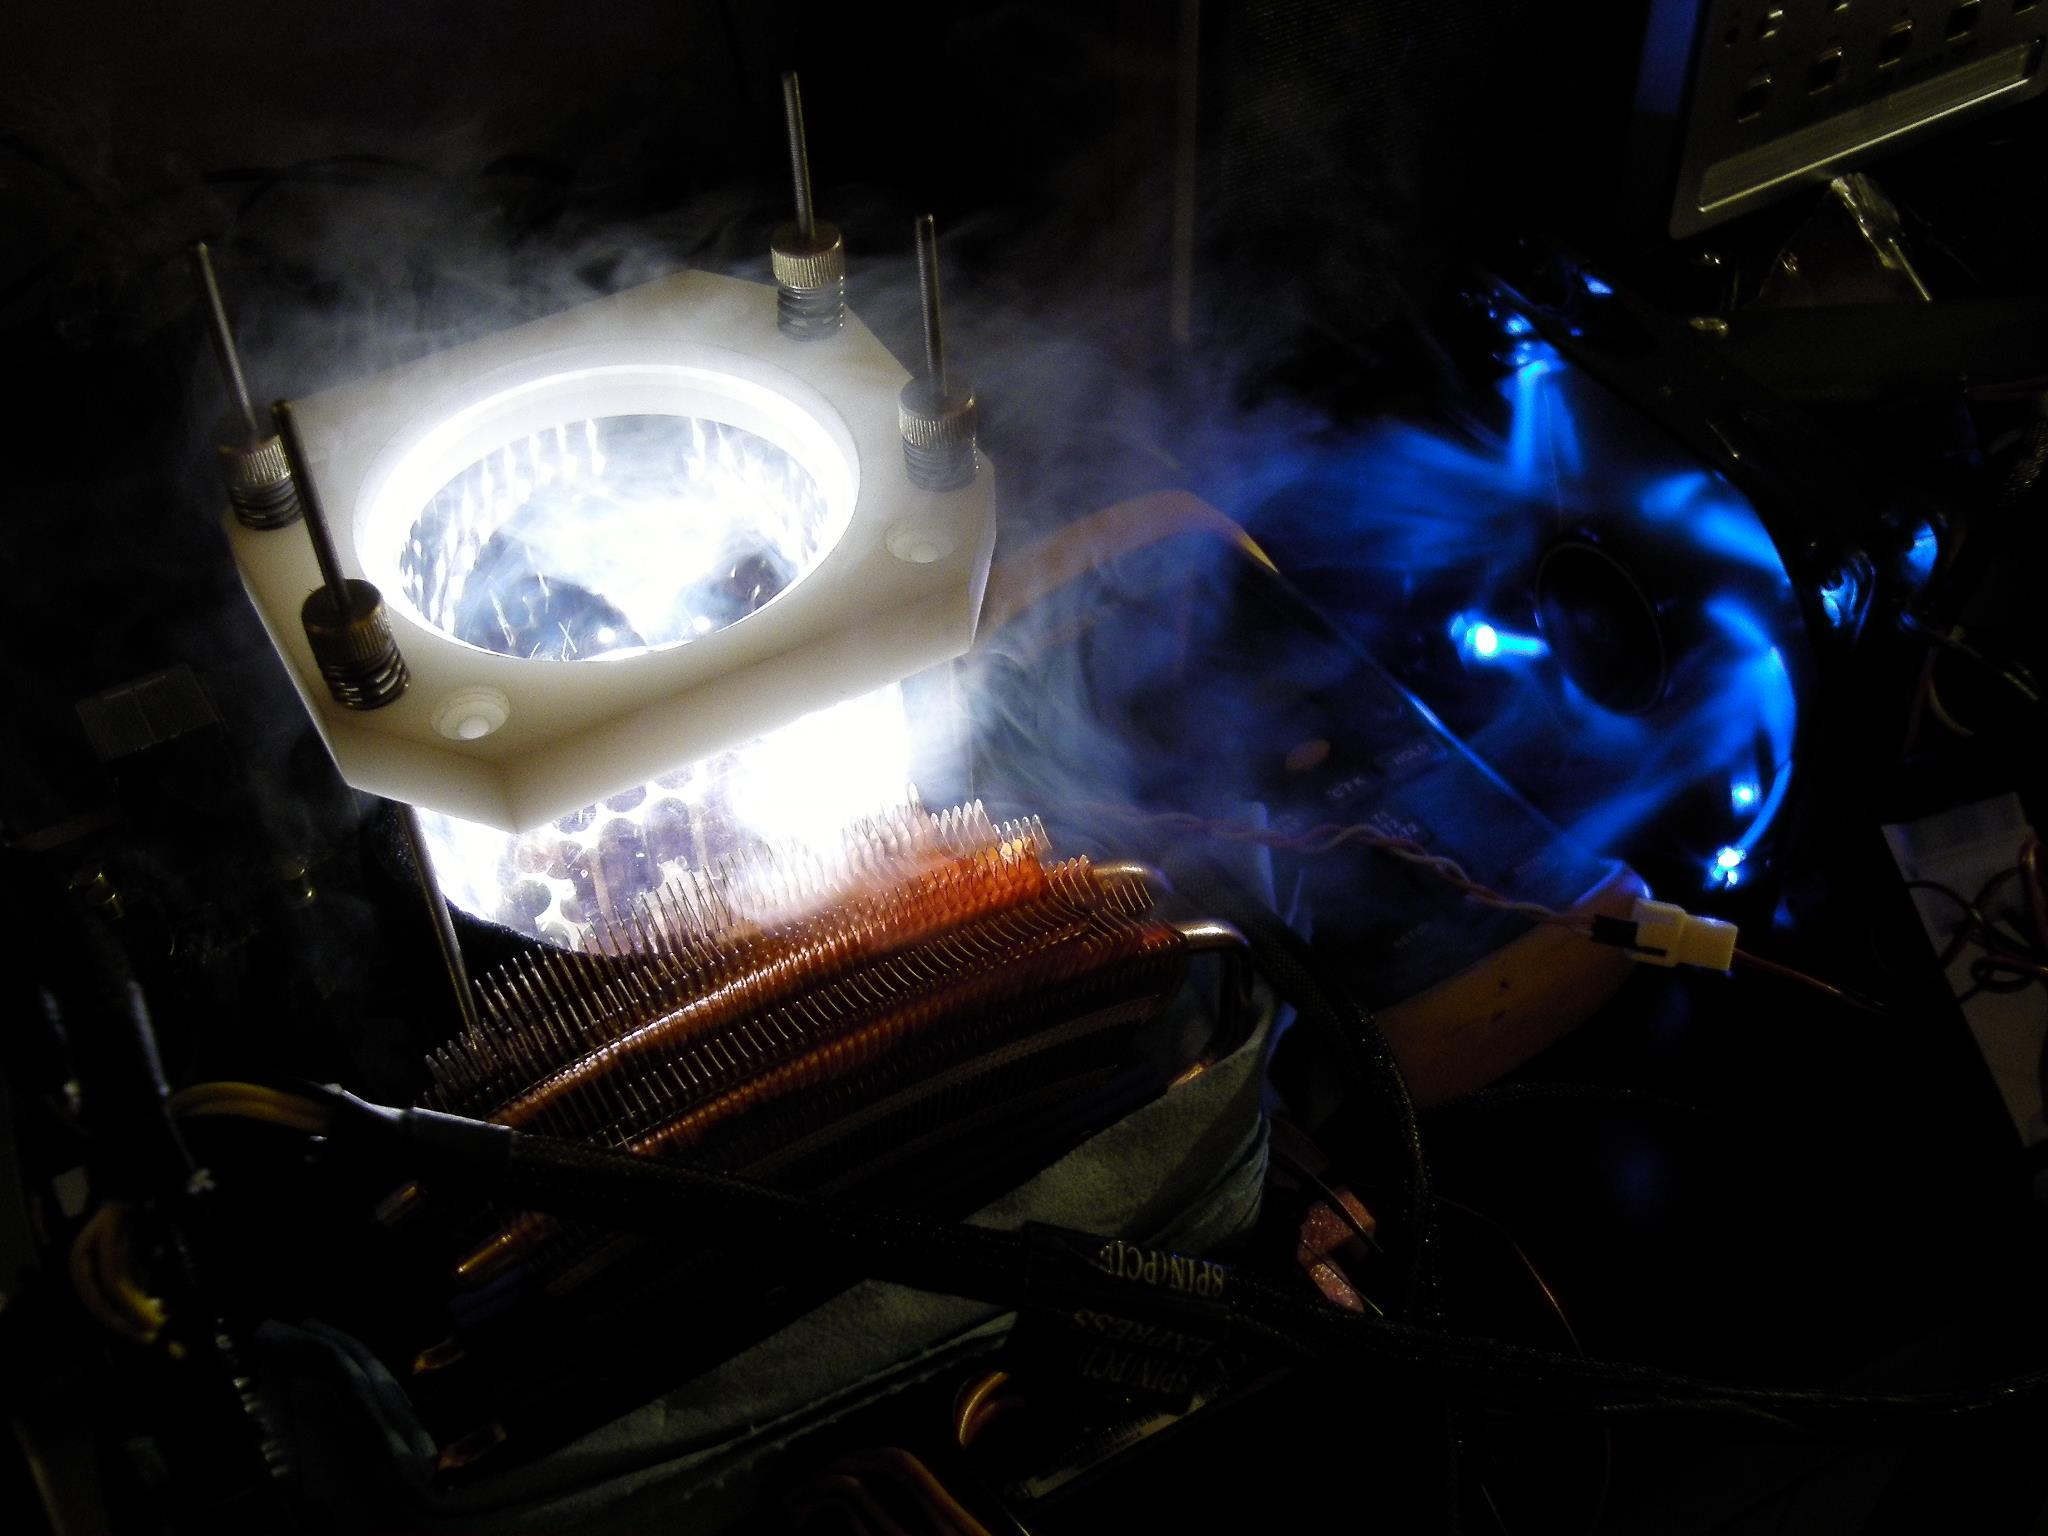 LEDを埋め込み、明るくして液体窒素の流動を観察したという(写真提供:Chi-Kui Lam氏)